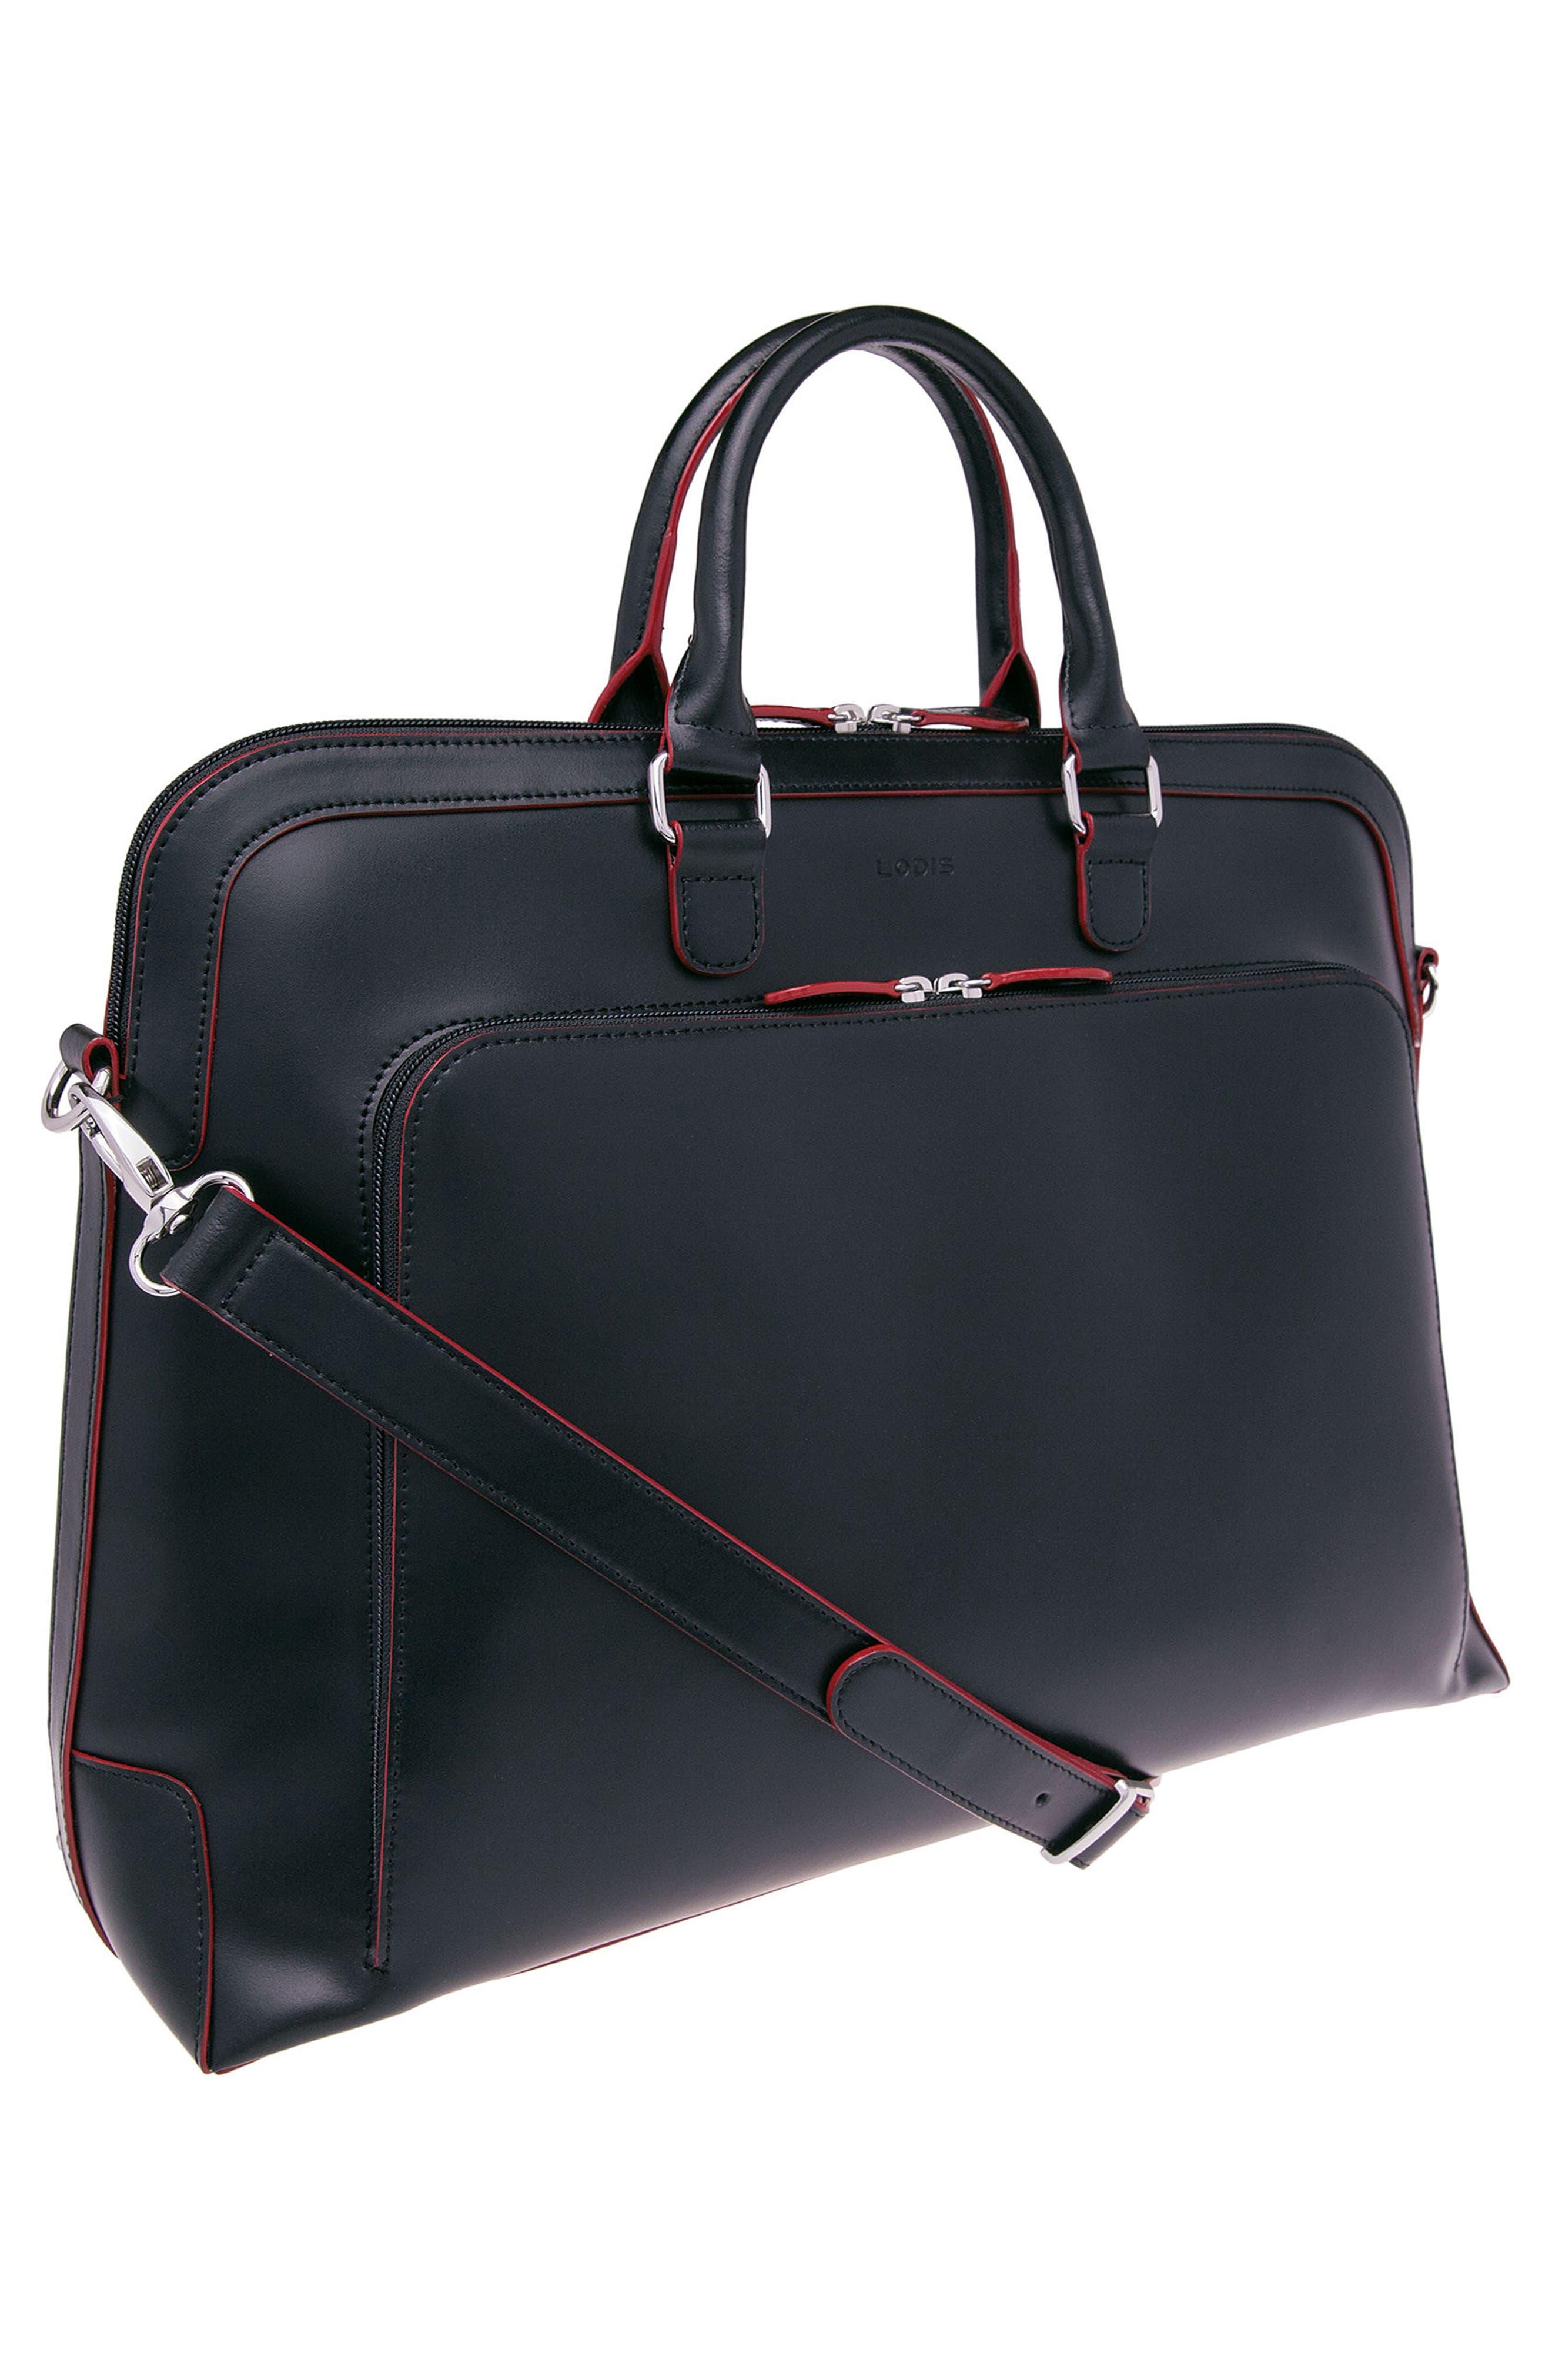 Lodis 'Audrey Brera' Leather Briefcase,                             Alternate thumbnail 4, color,                             001